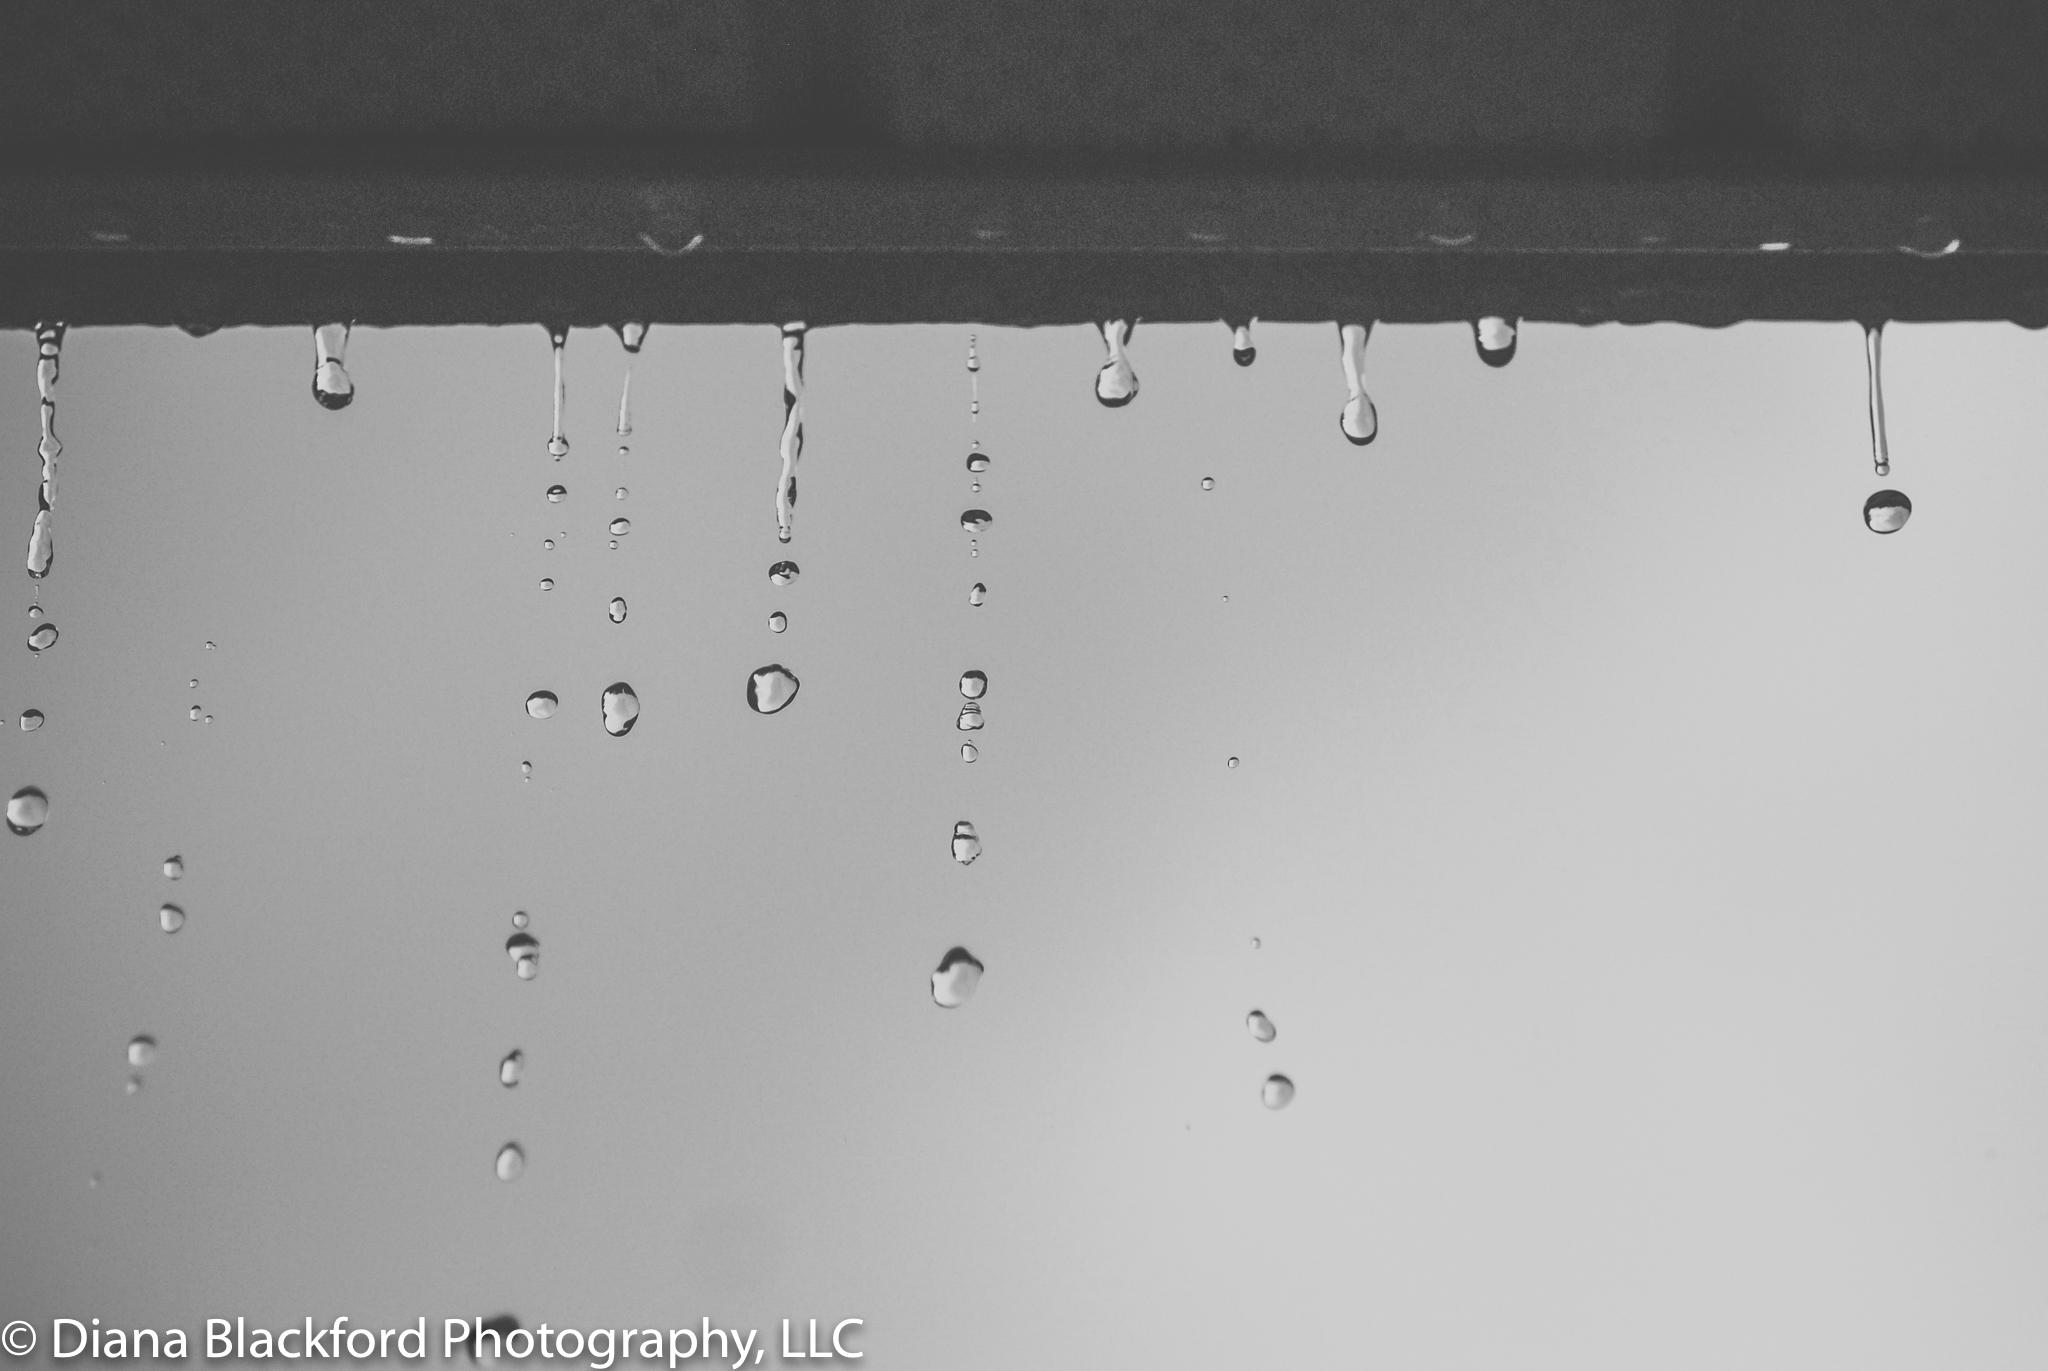 DSC_0011-3.jpg